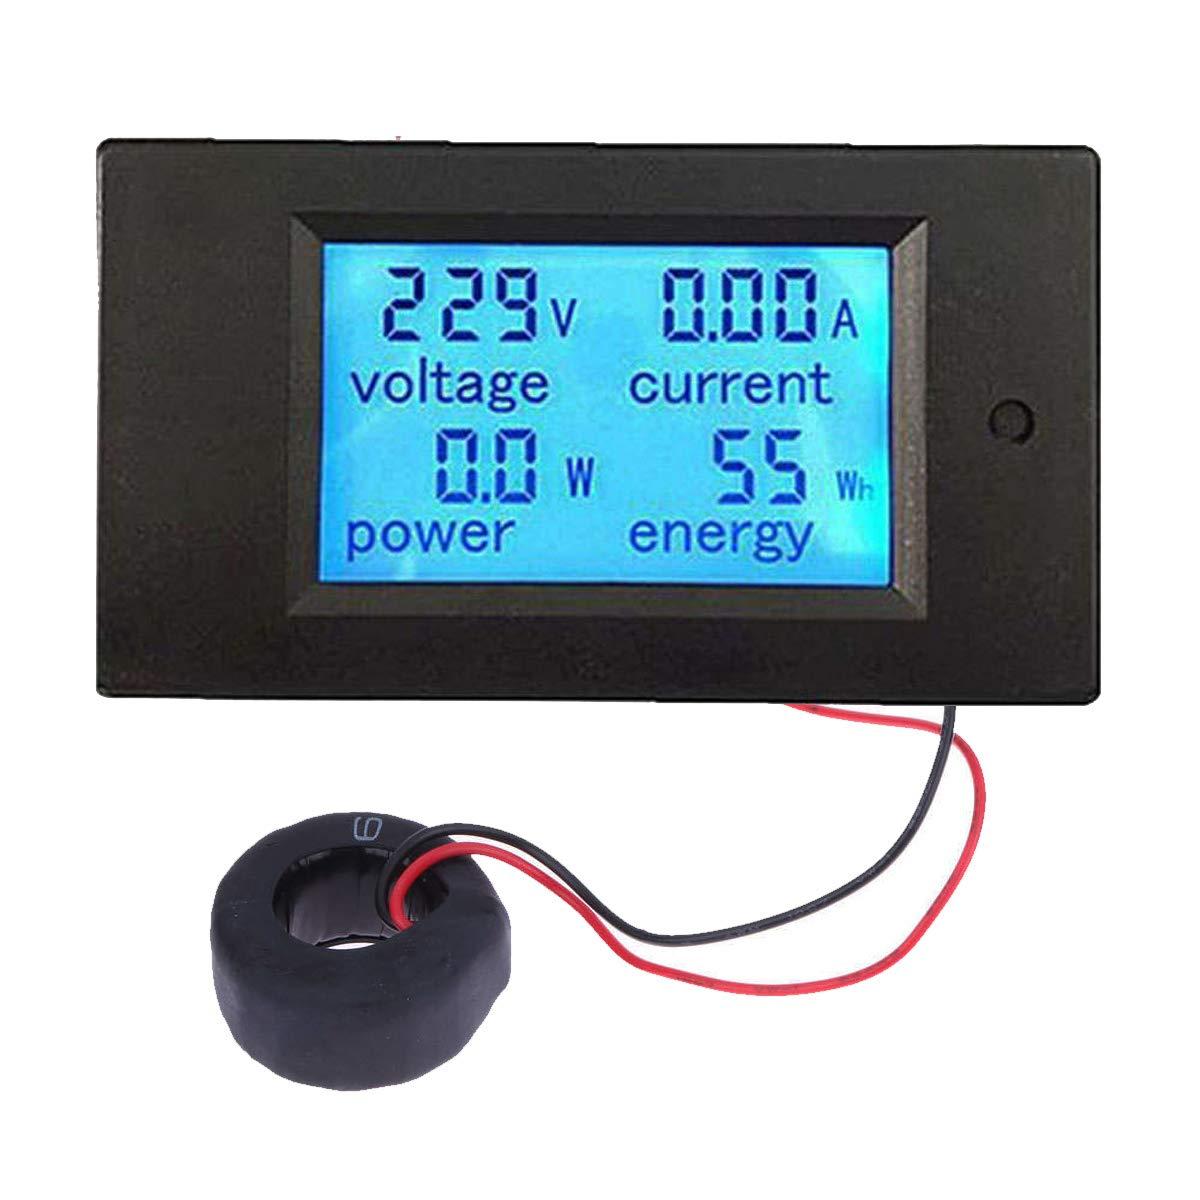 Baitaihem AC 80-260V 100A LCD Display Digital Current Voltage Power Energy Meter Multimeter Ammeter Voltmeter by Baitaihem (Image #1)